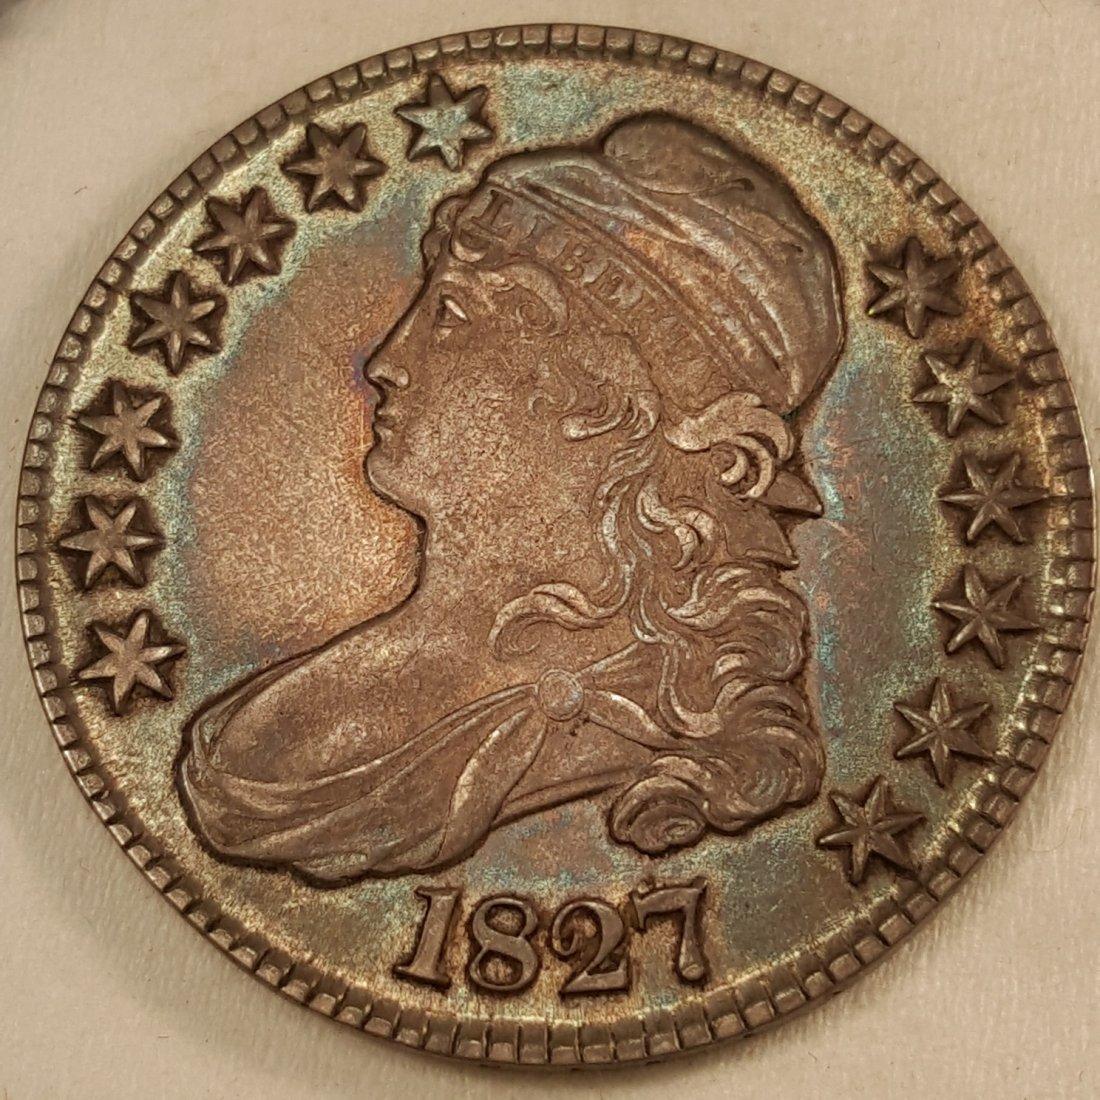 1827 50C CHAU55 GREAT COLOR, VERY CHOICE.